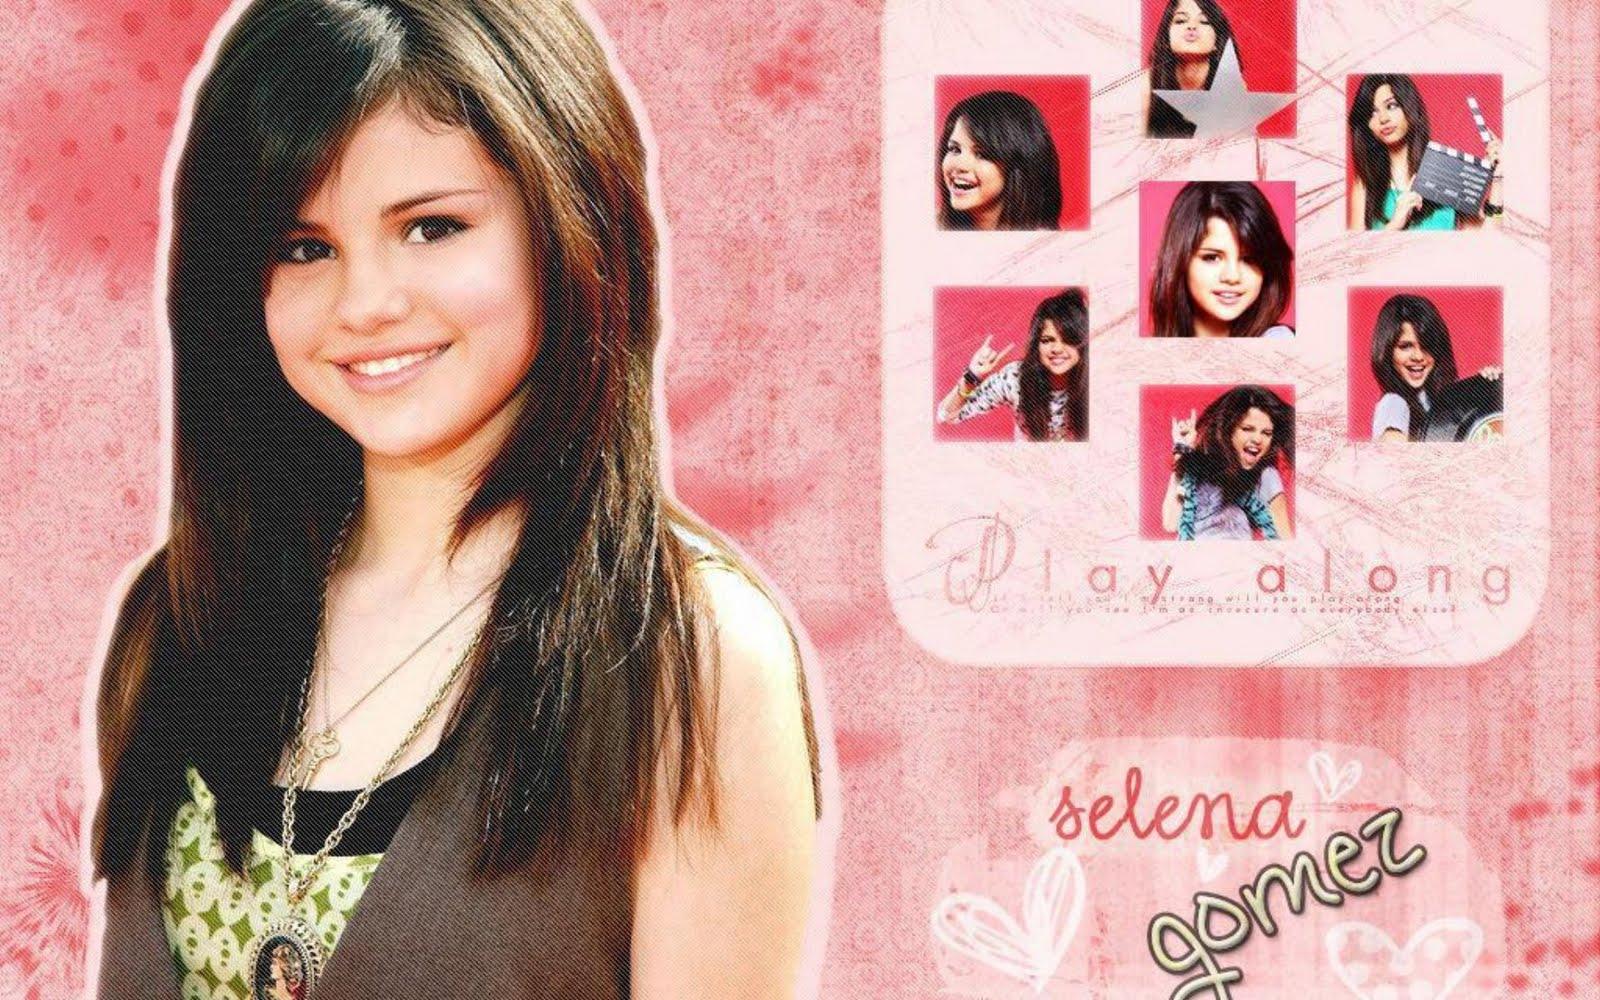 http://2.bp.blogspot.com/-r9Z2mqzNioI/TphCfZfeAXI/AAAAAAAAAbc/LQsPiljNoas/s1600/Selena_Gomez_HD_Wallpaper_face_smile.jpg